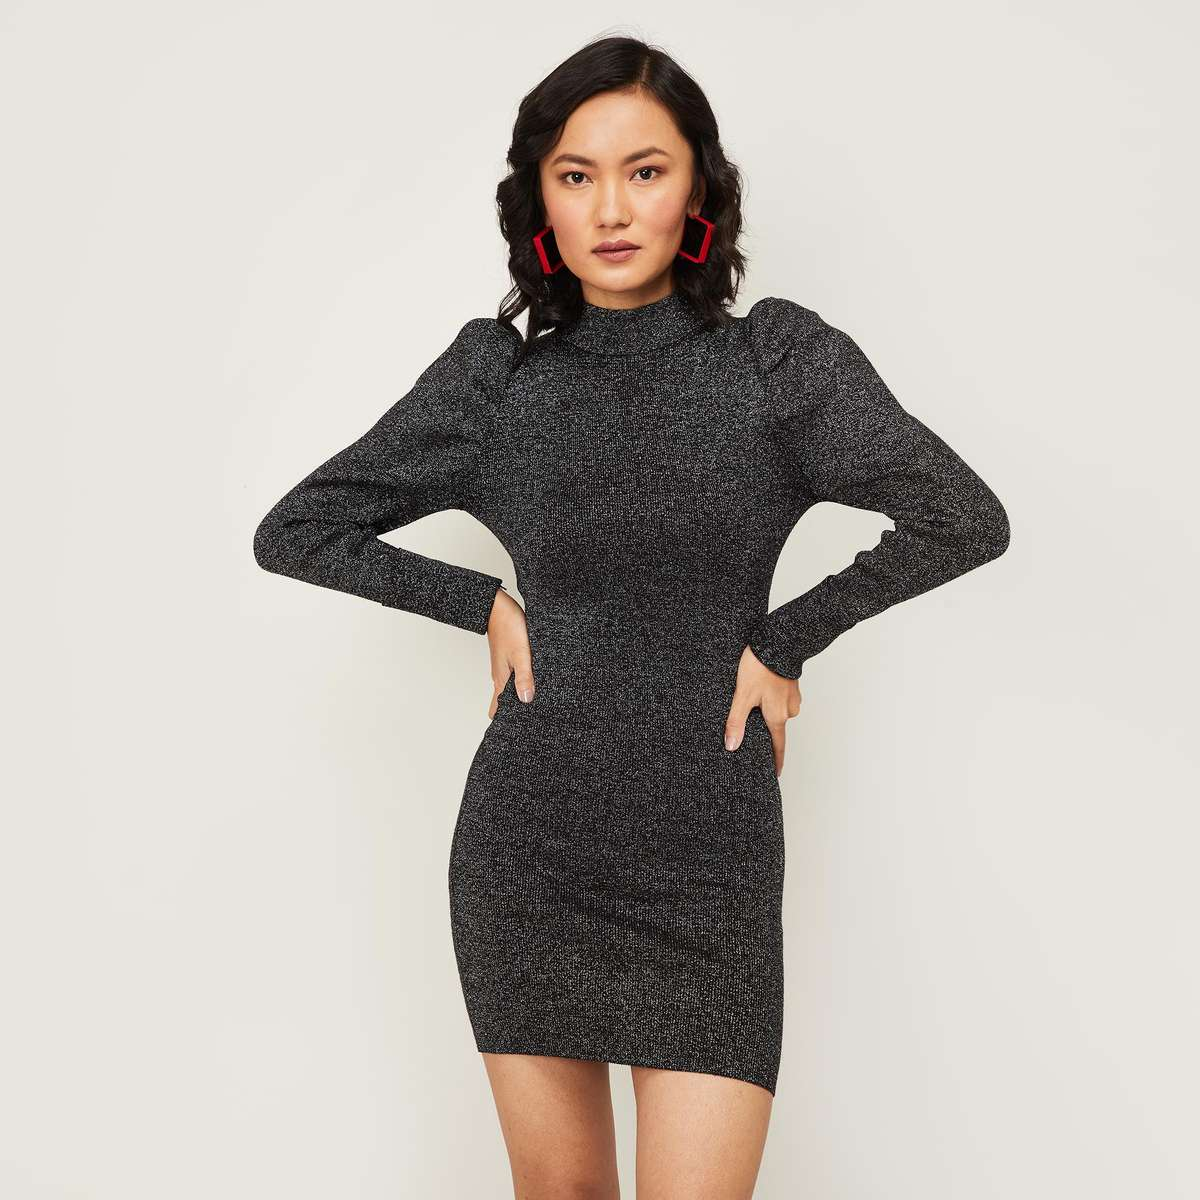 2.GINGER Women Textured Bodycon Dress